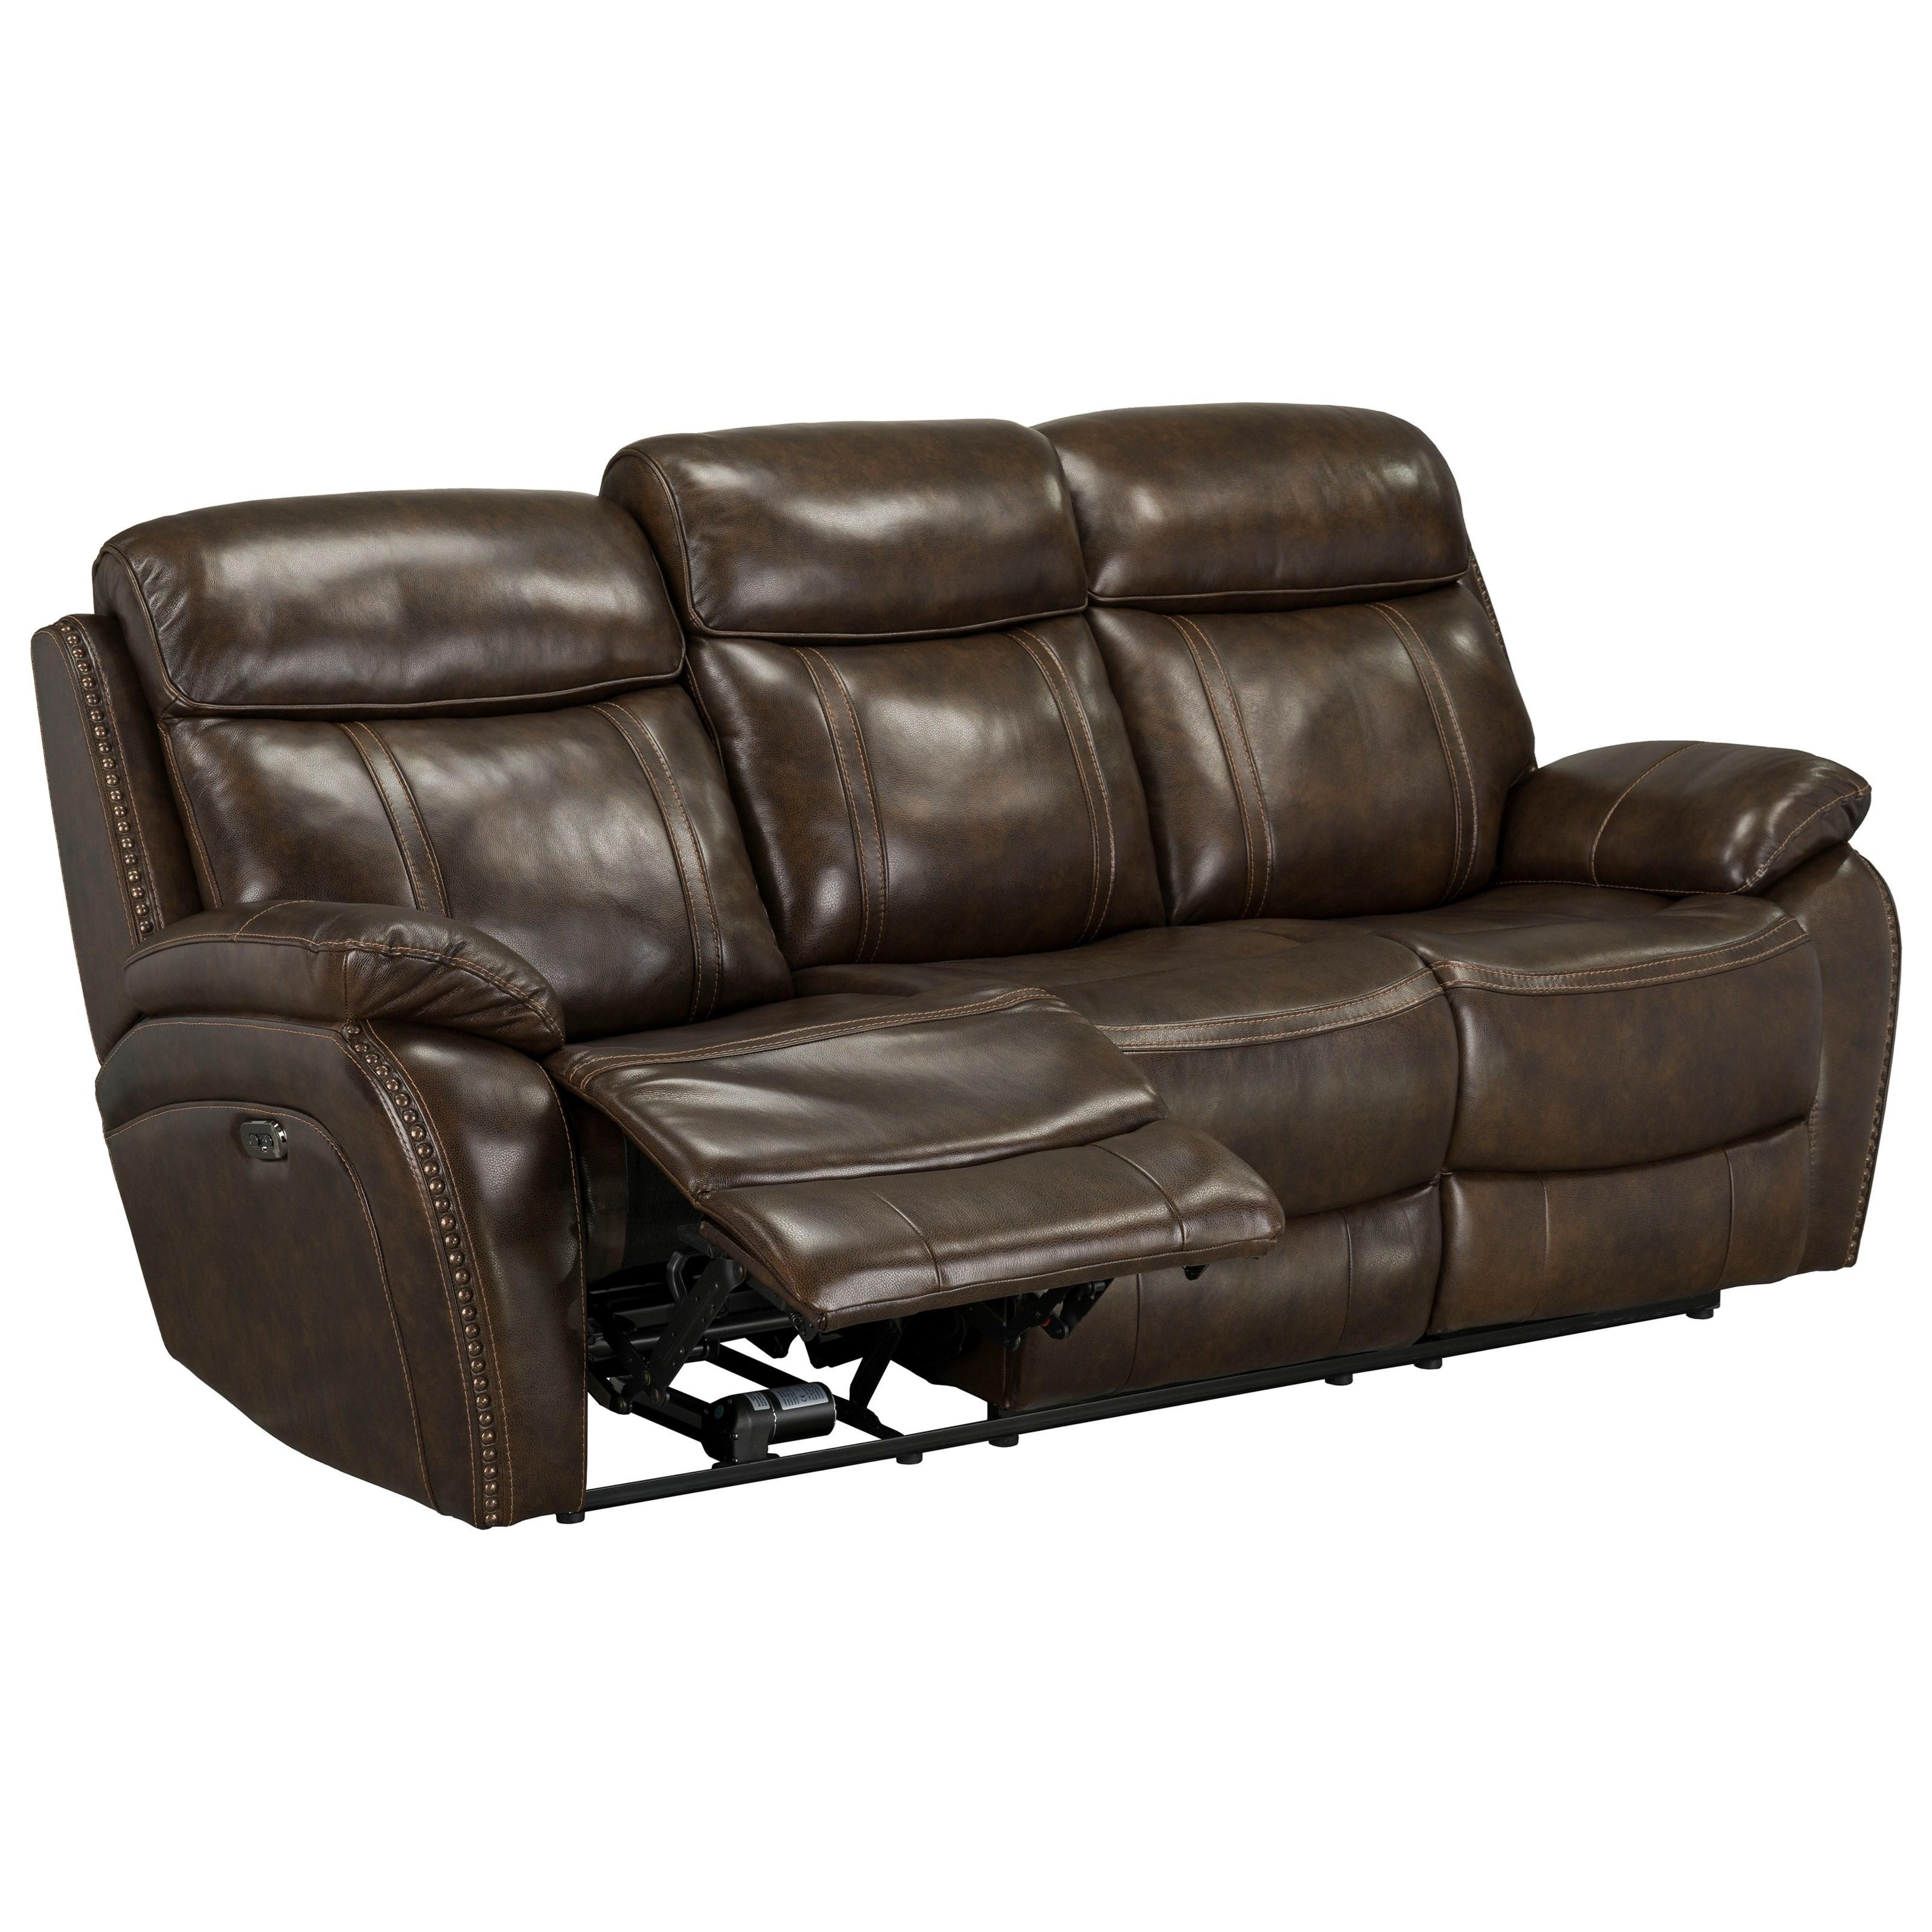 reclining sofa with nailhead trim bed cover canada standard furniture edmond manual nail